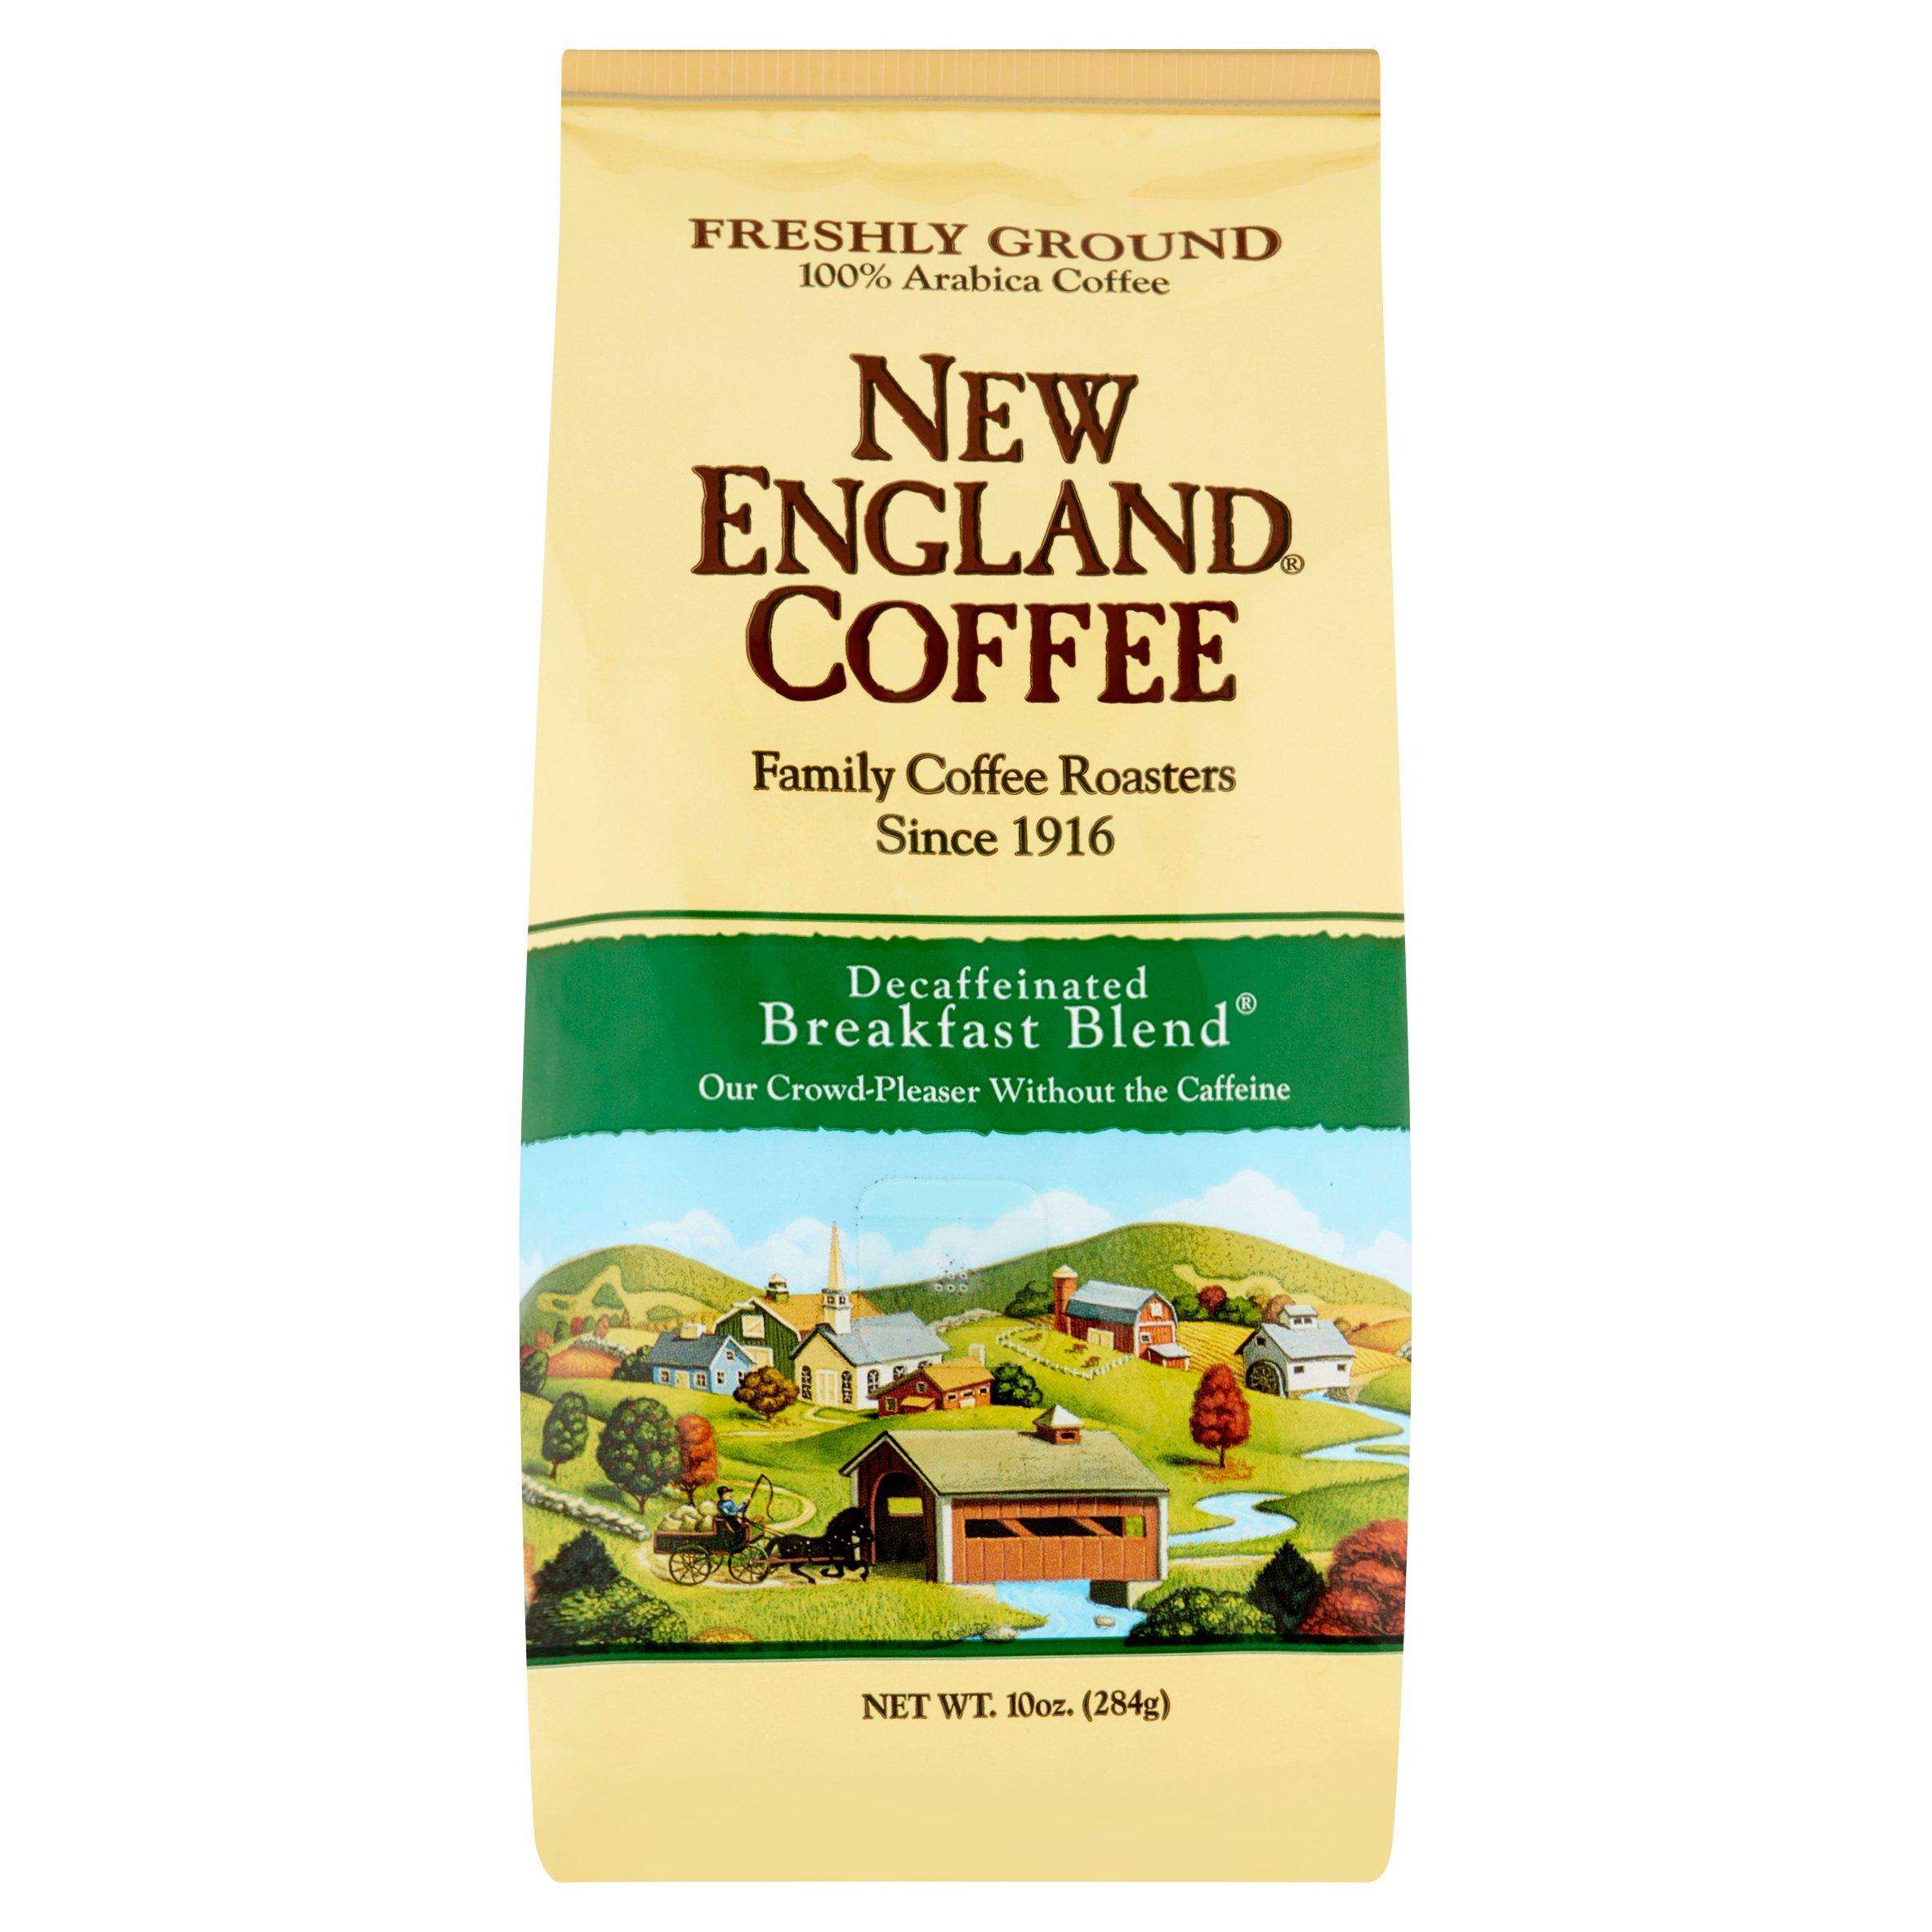 New England® Coffee Decaffeinated Breakfast Blend Freshly Ground 100% Arabica Coffee 10 oz. Bag